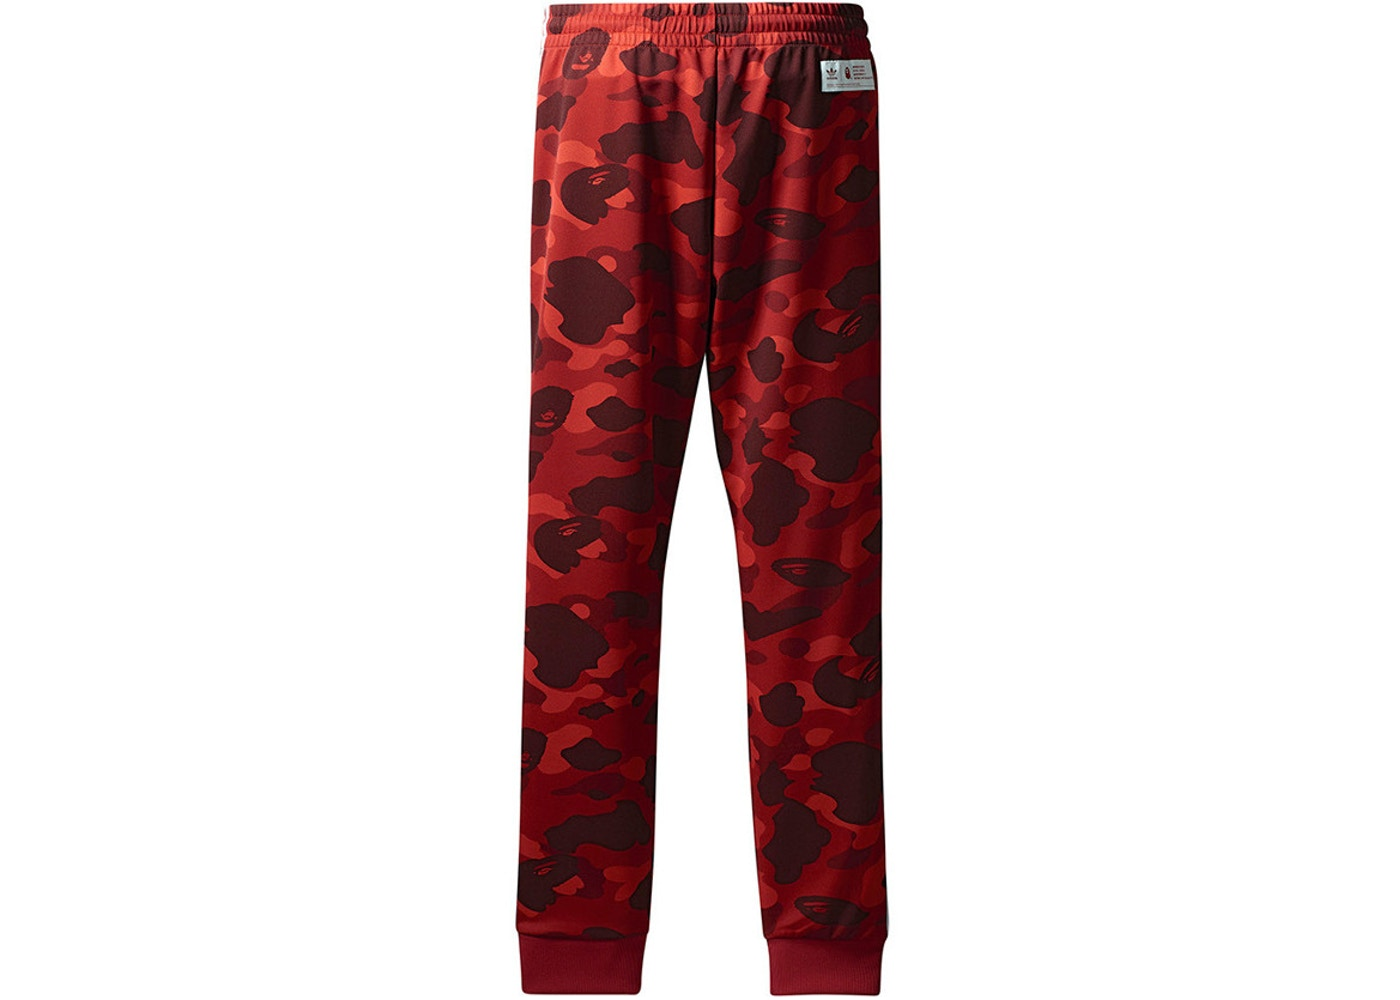 9cc87e085 BAPE x adidas adicolor Track Pants Raw Red - FW18